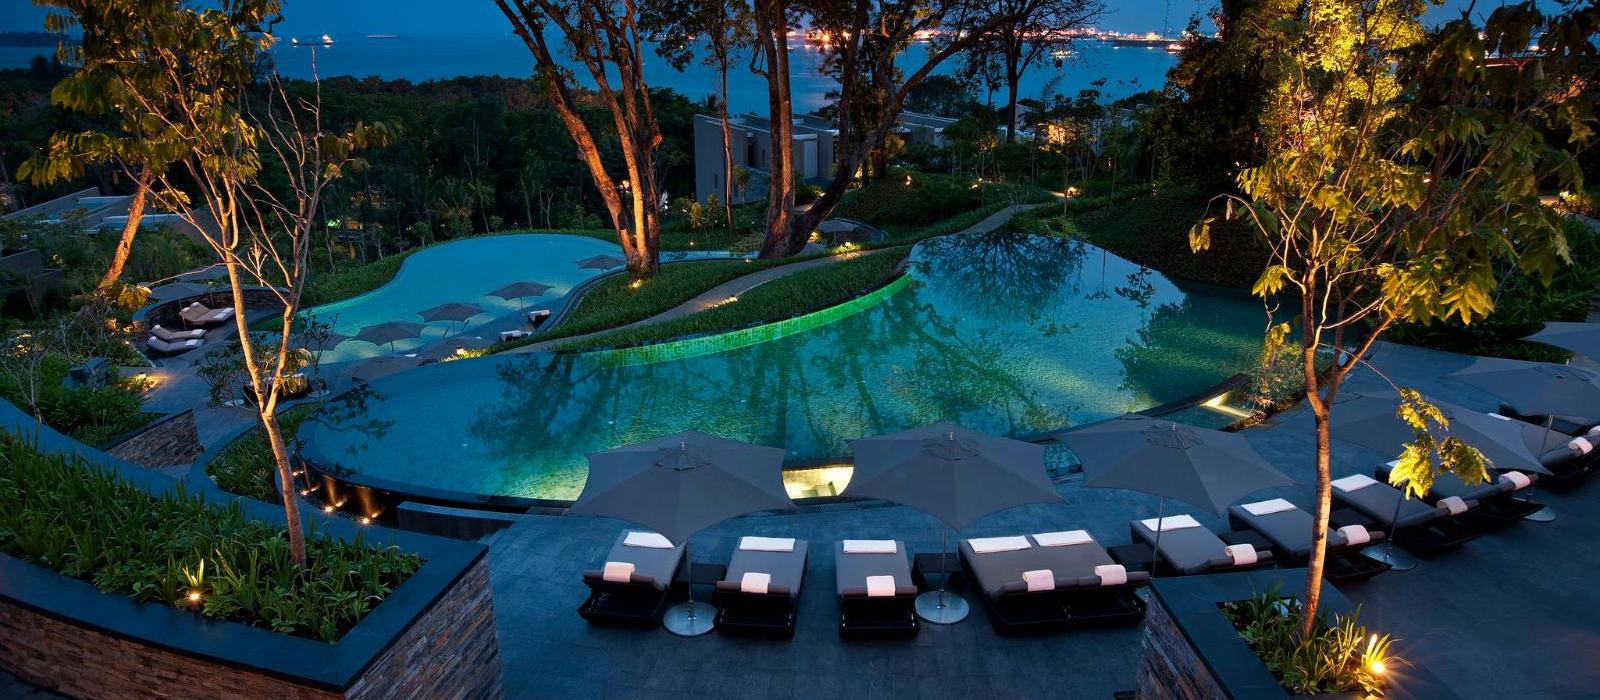 新加坡嘉佩乐酒店(Capella Singapore) 泳池景观图片  www.lhw.cn